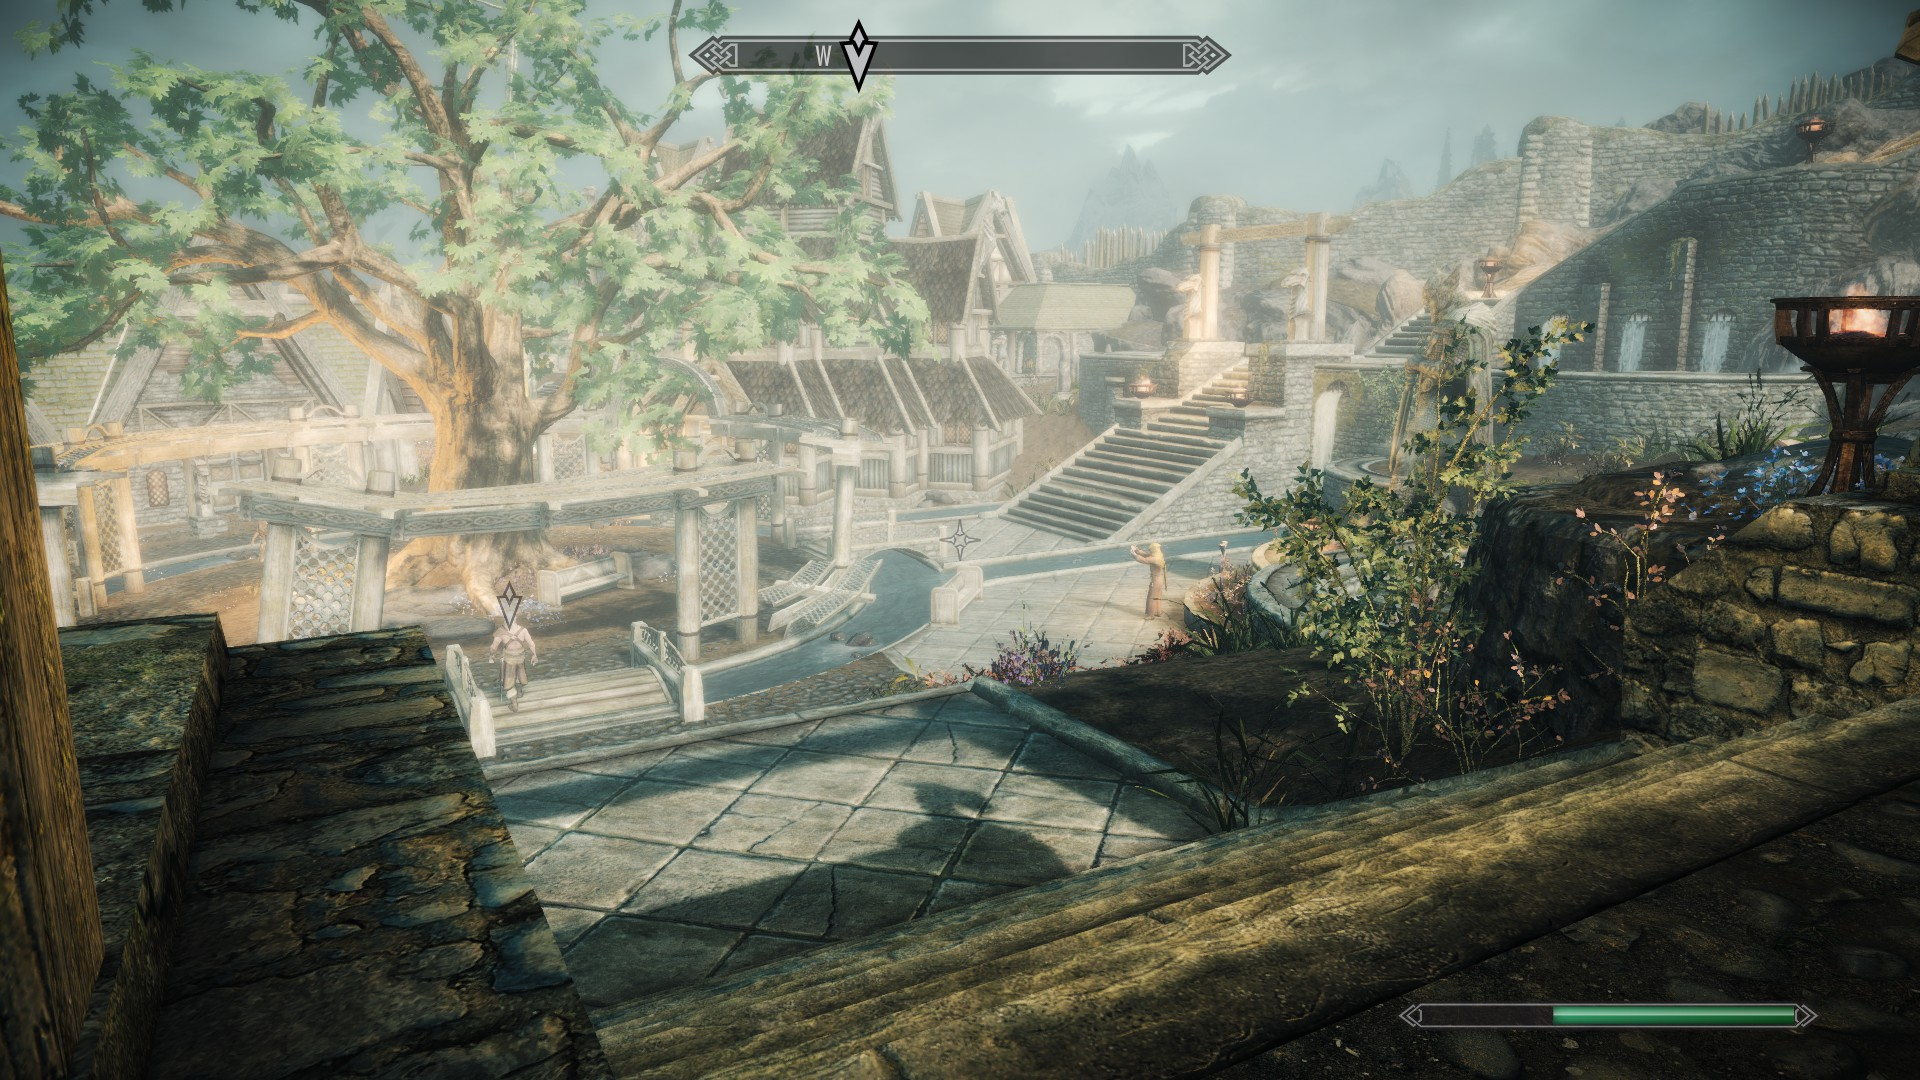 20180210150000_1.jpg - Elder Scrolls 5: Skyrim, the